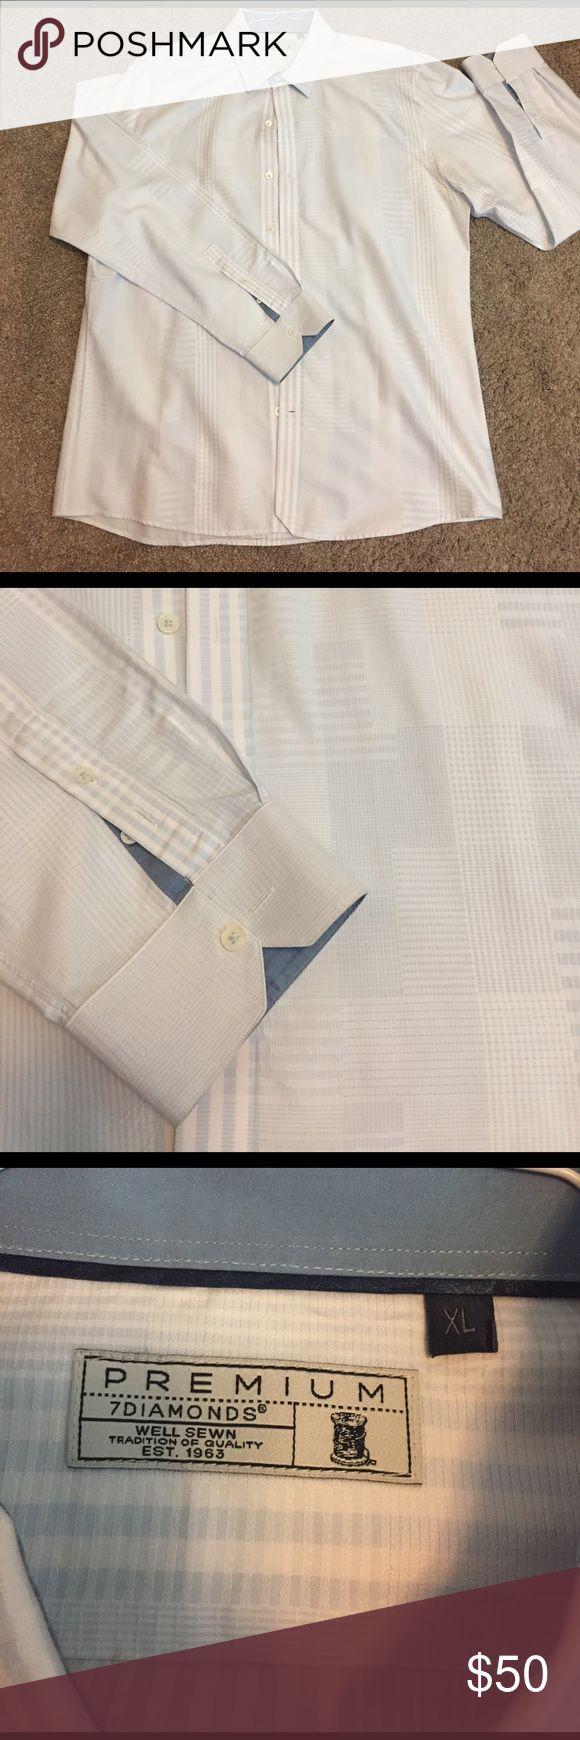 7 Diamonds Premium Men's Shirt Size: XL. 7 Diamonds Premium men's dress shirt. Worn a couple times. No stains or spots. White and light blue pattern. 7 Diamonds Shirts Dress Shirts